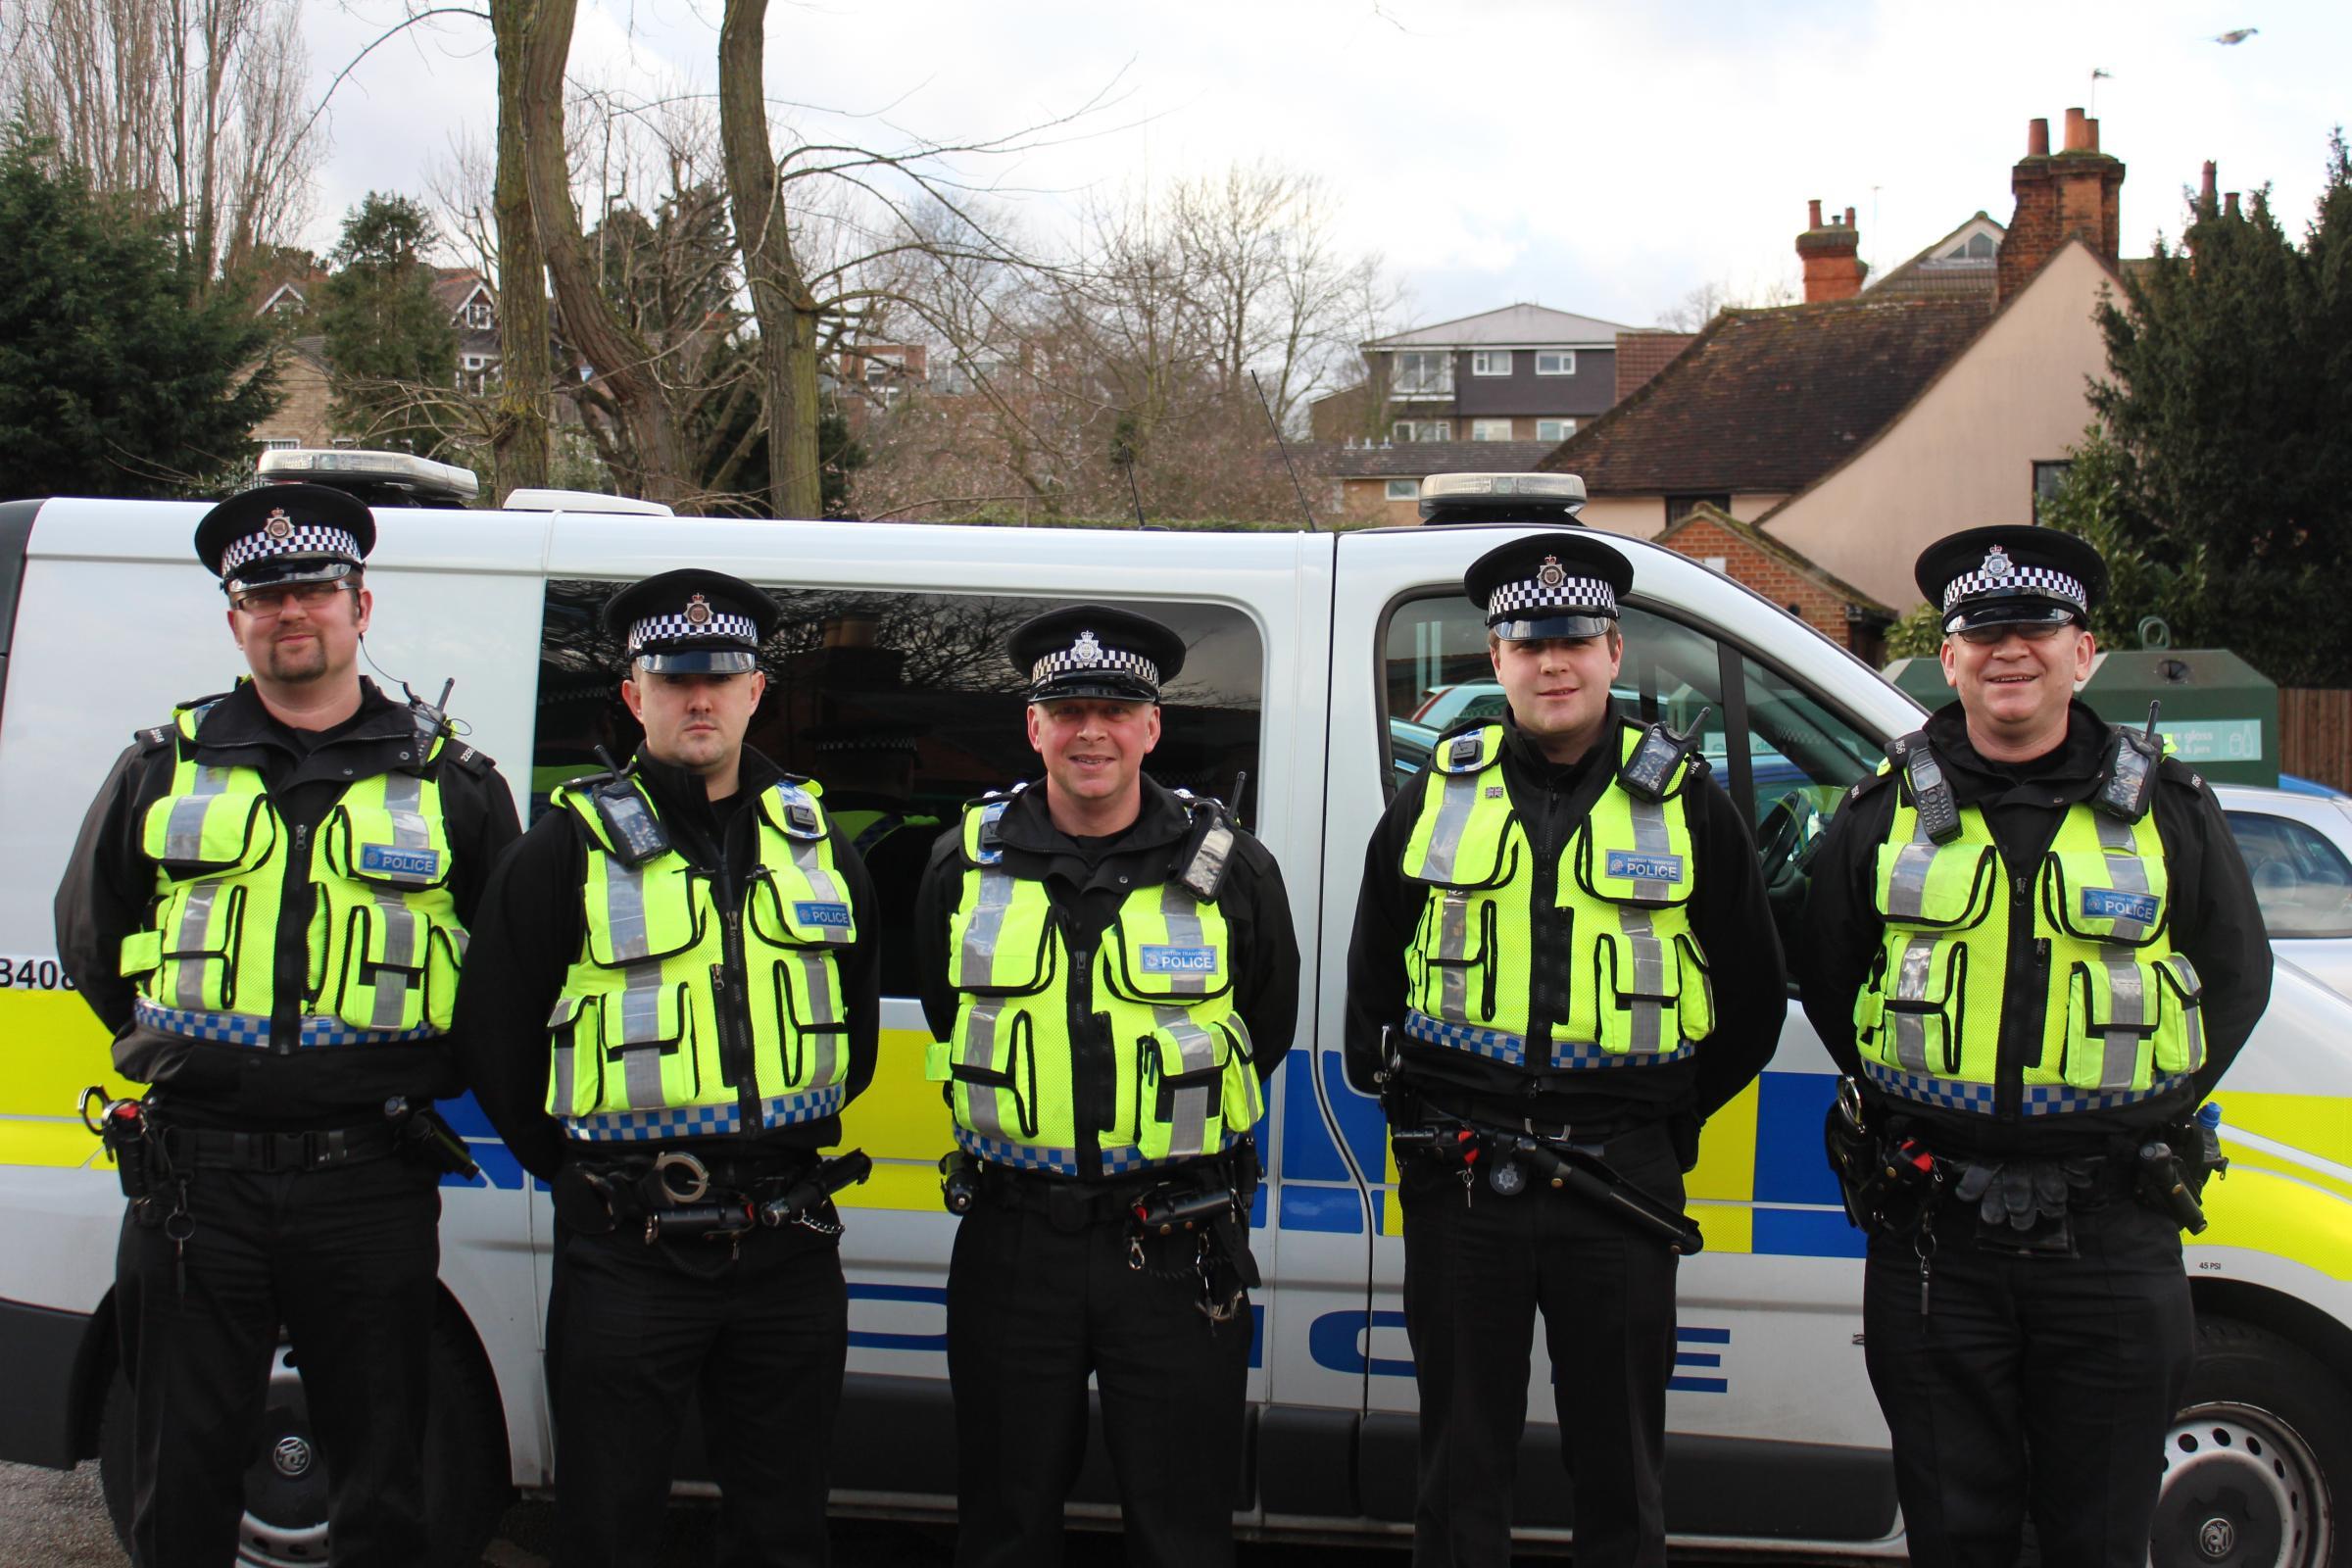 Police officer dating uk